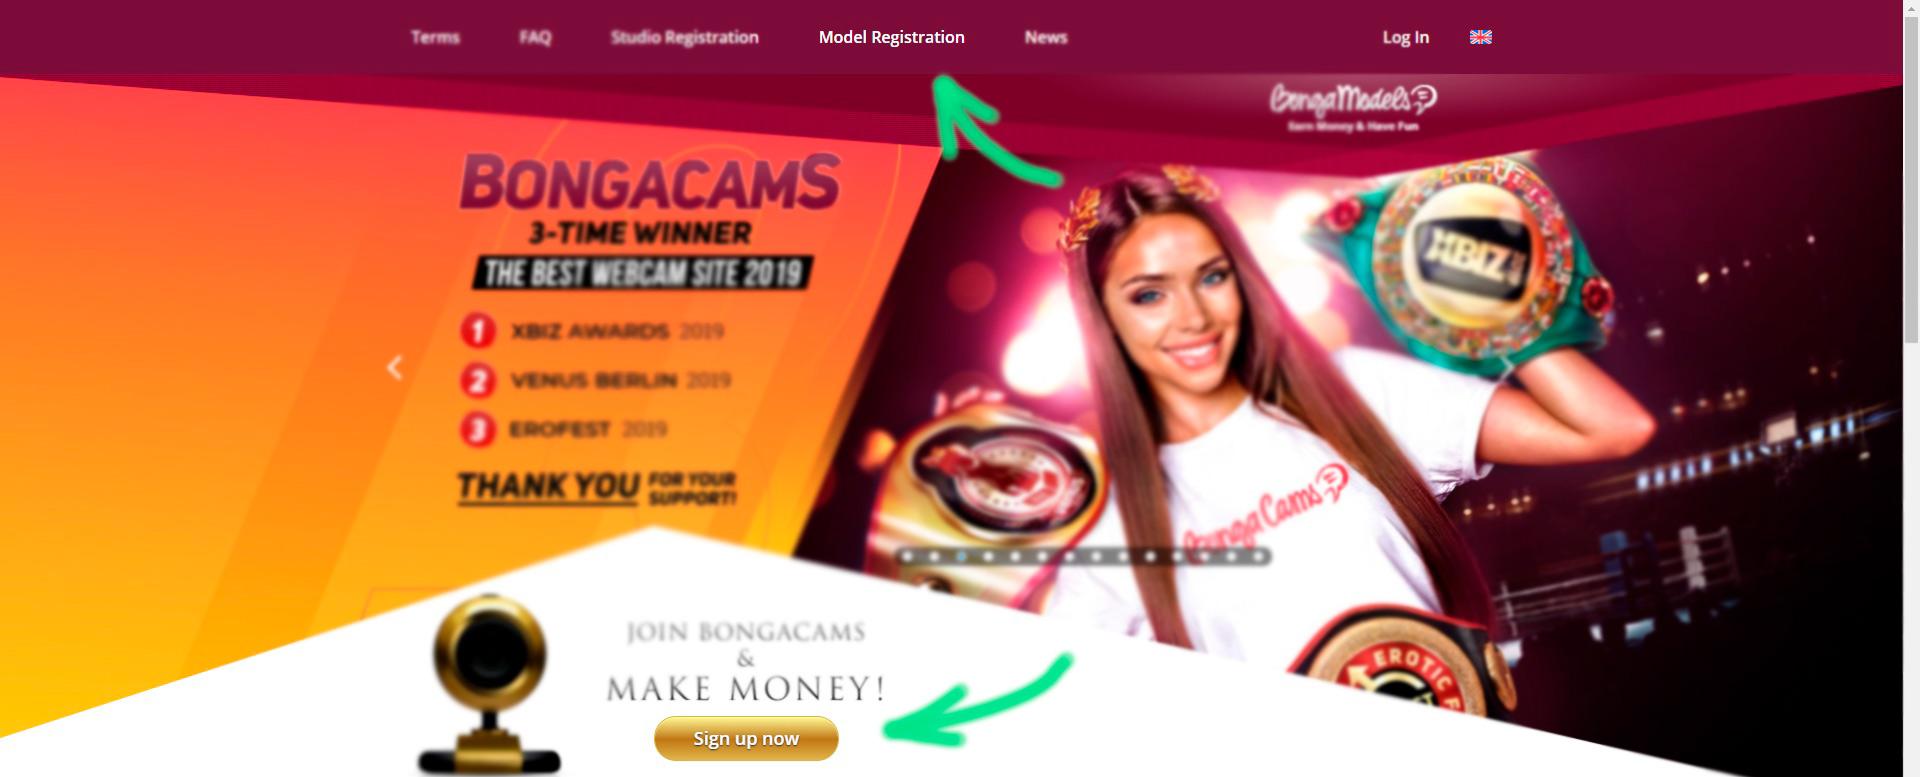 BongaModels-registration